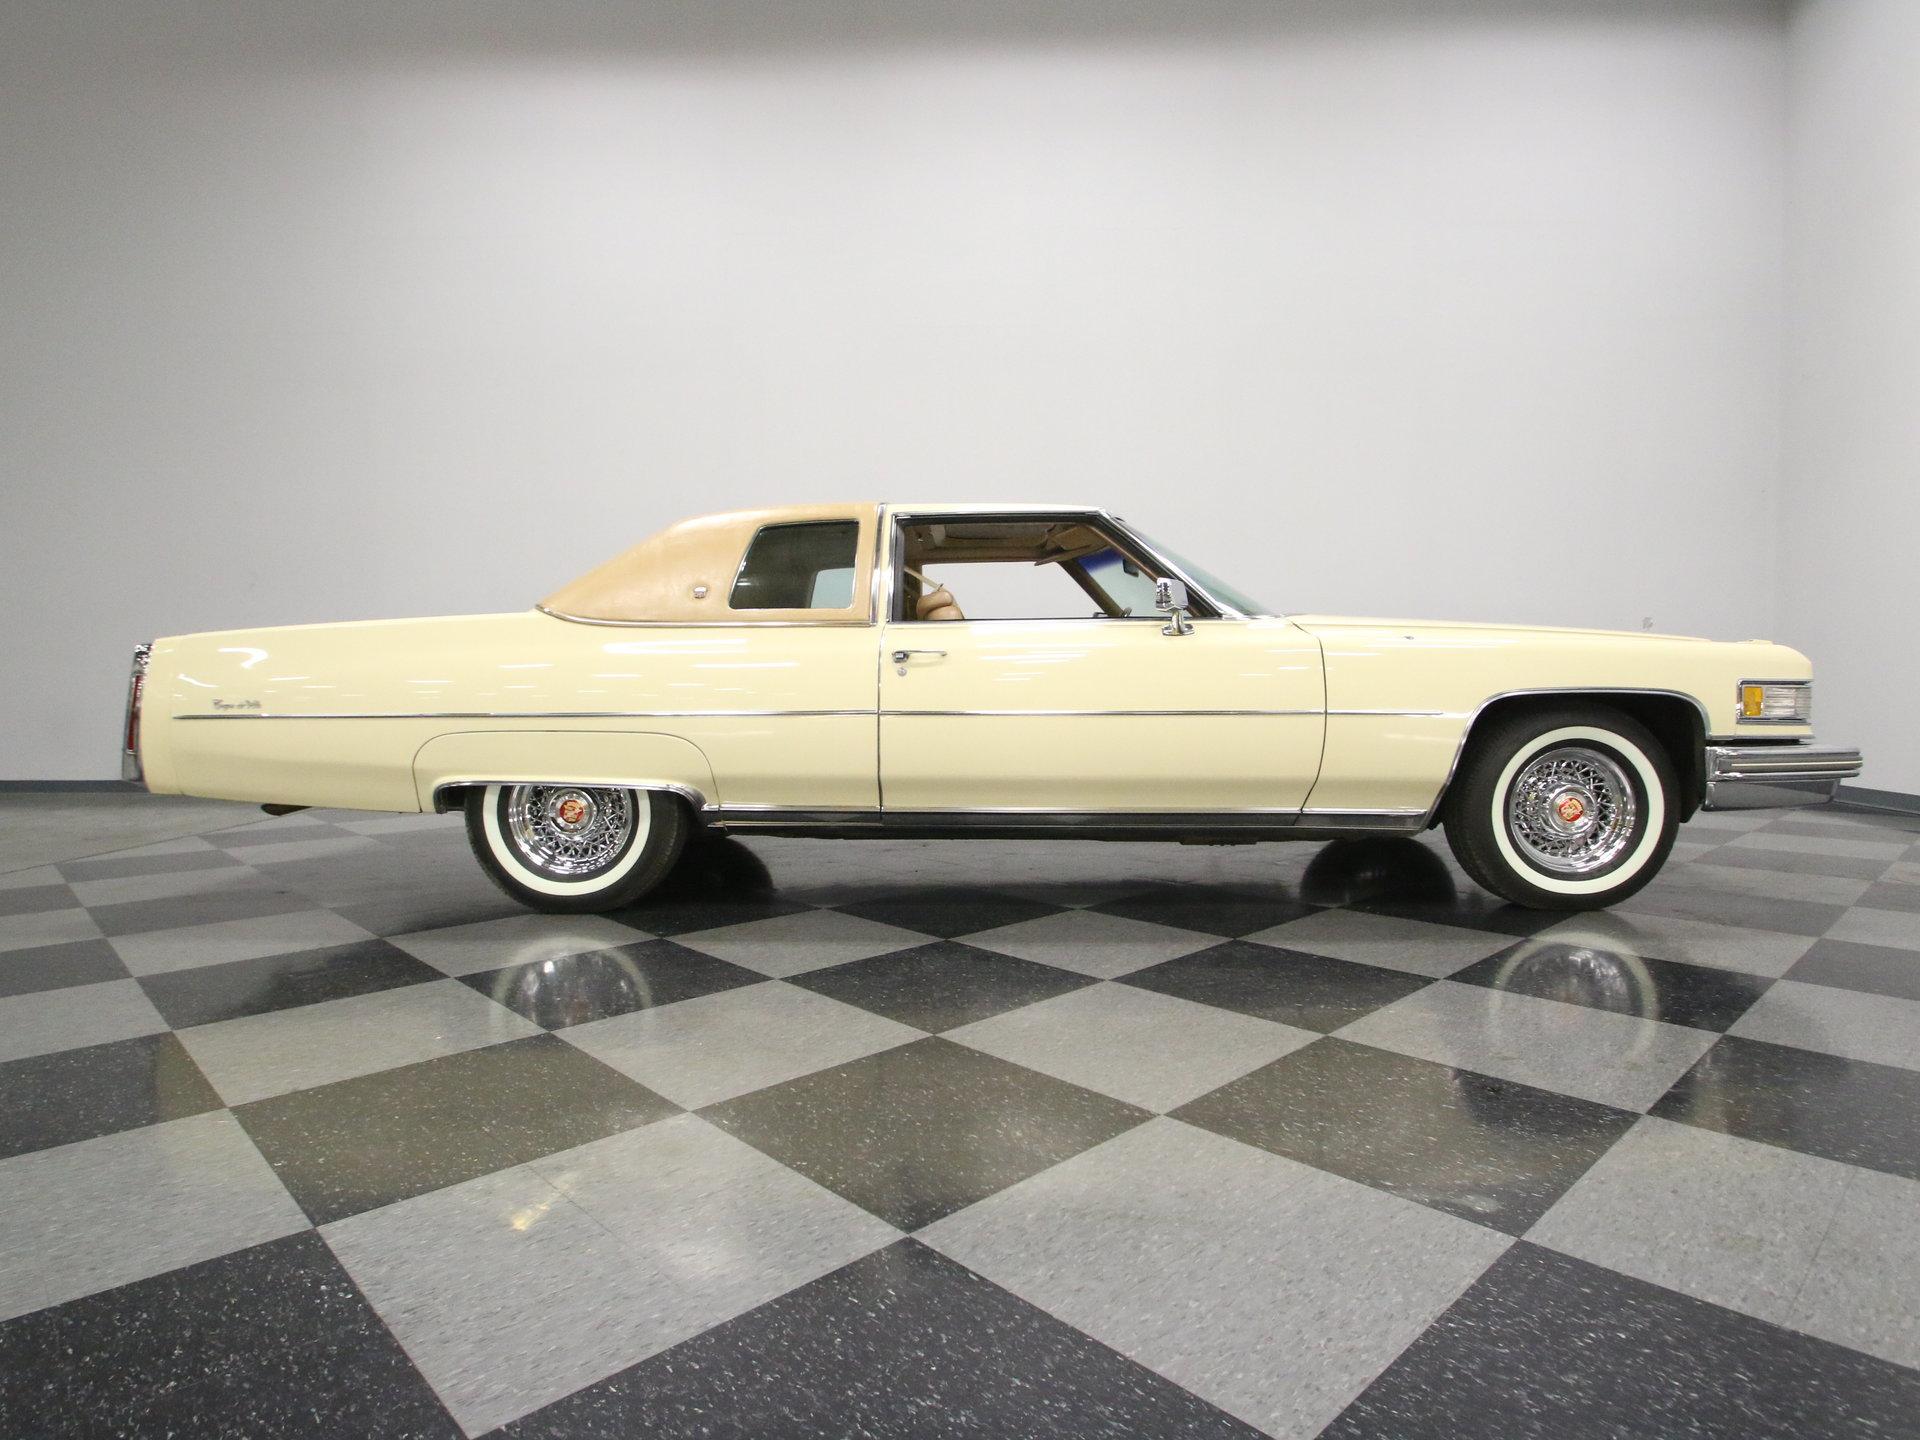 1976 Cadillac Coupe Deville For Sale 76094 Mcg